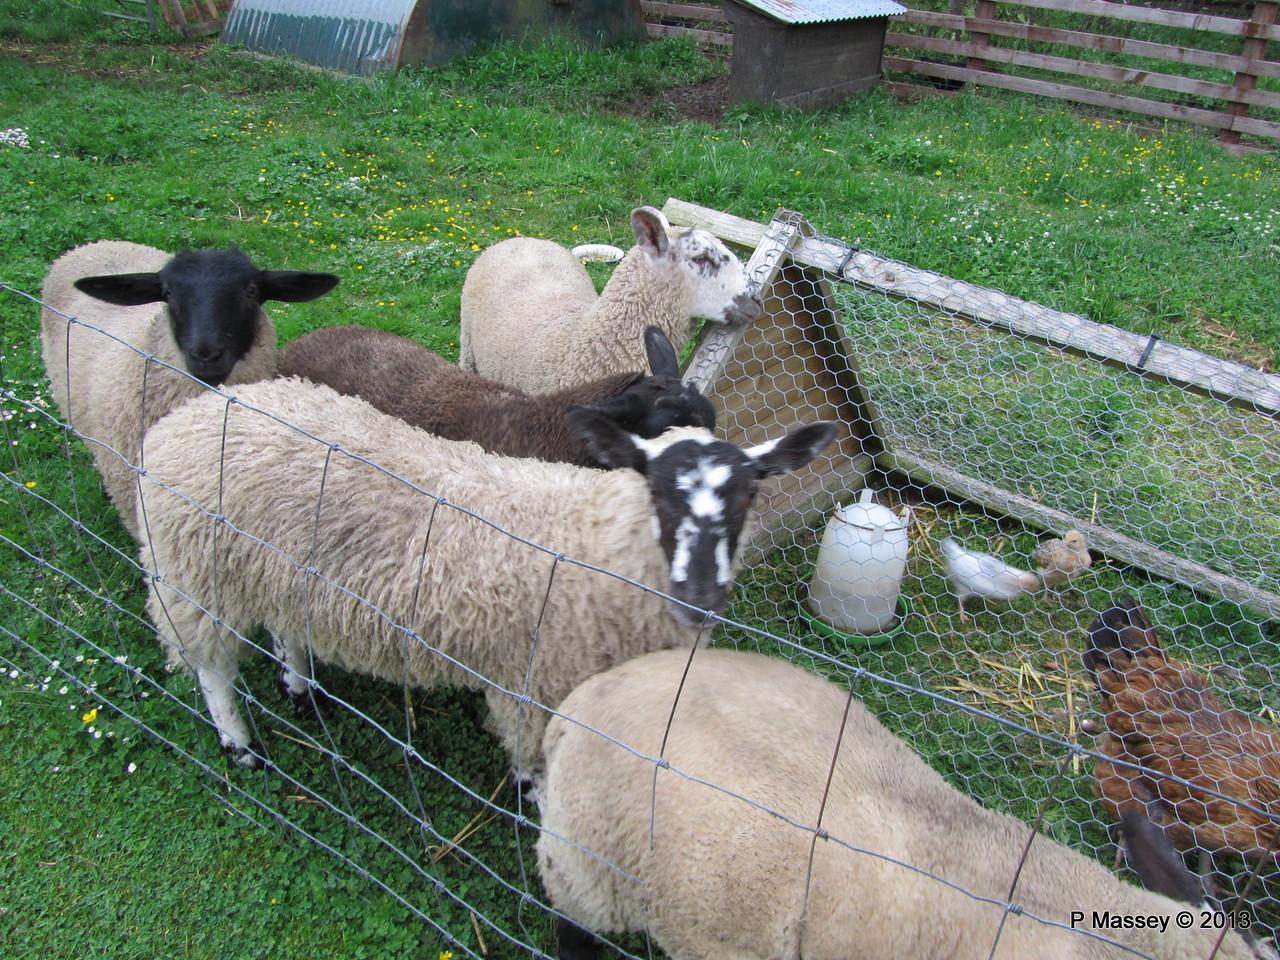 High Rigg Farm 24-06-2013 16-02-33